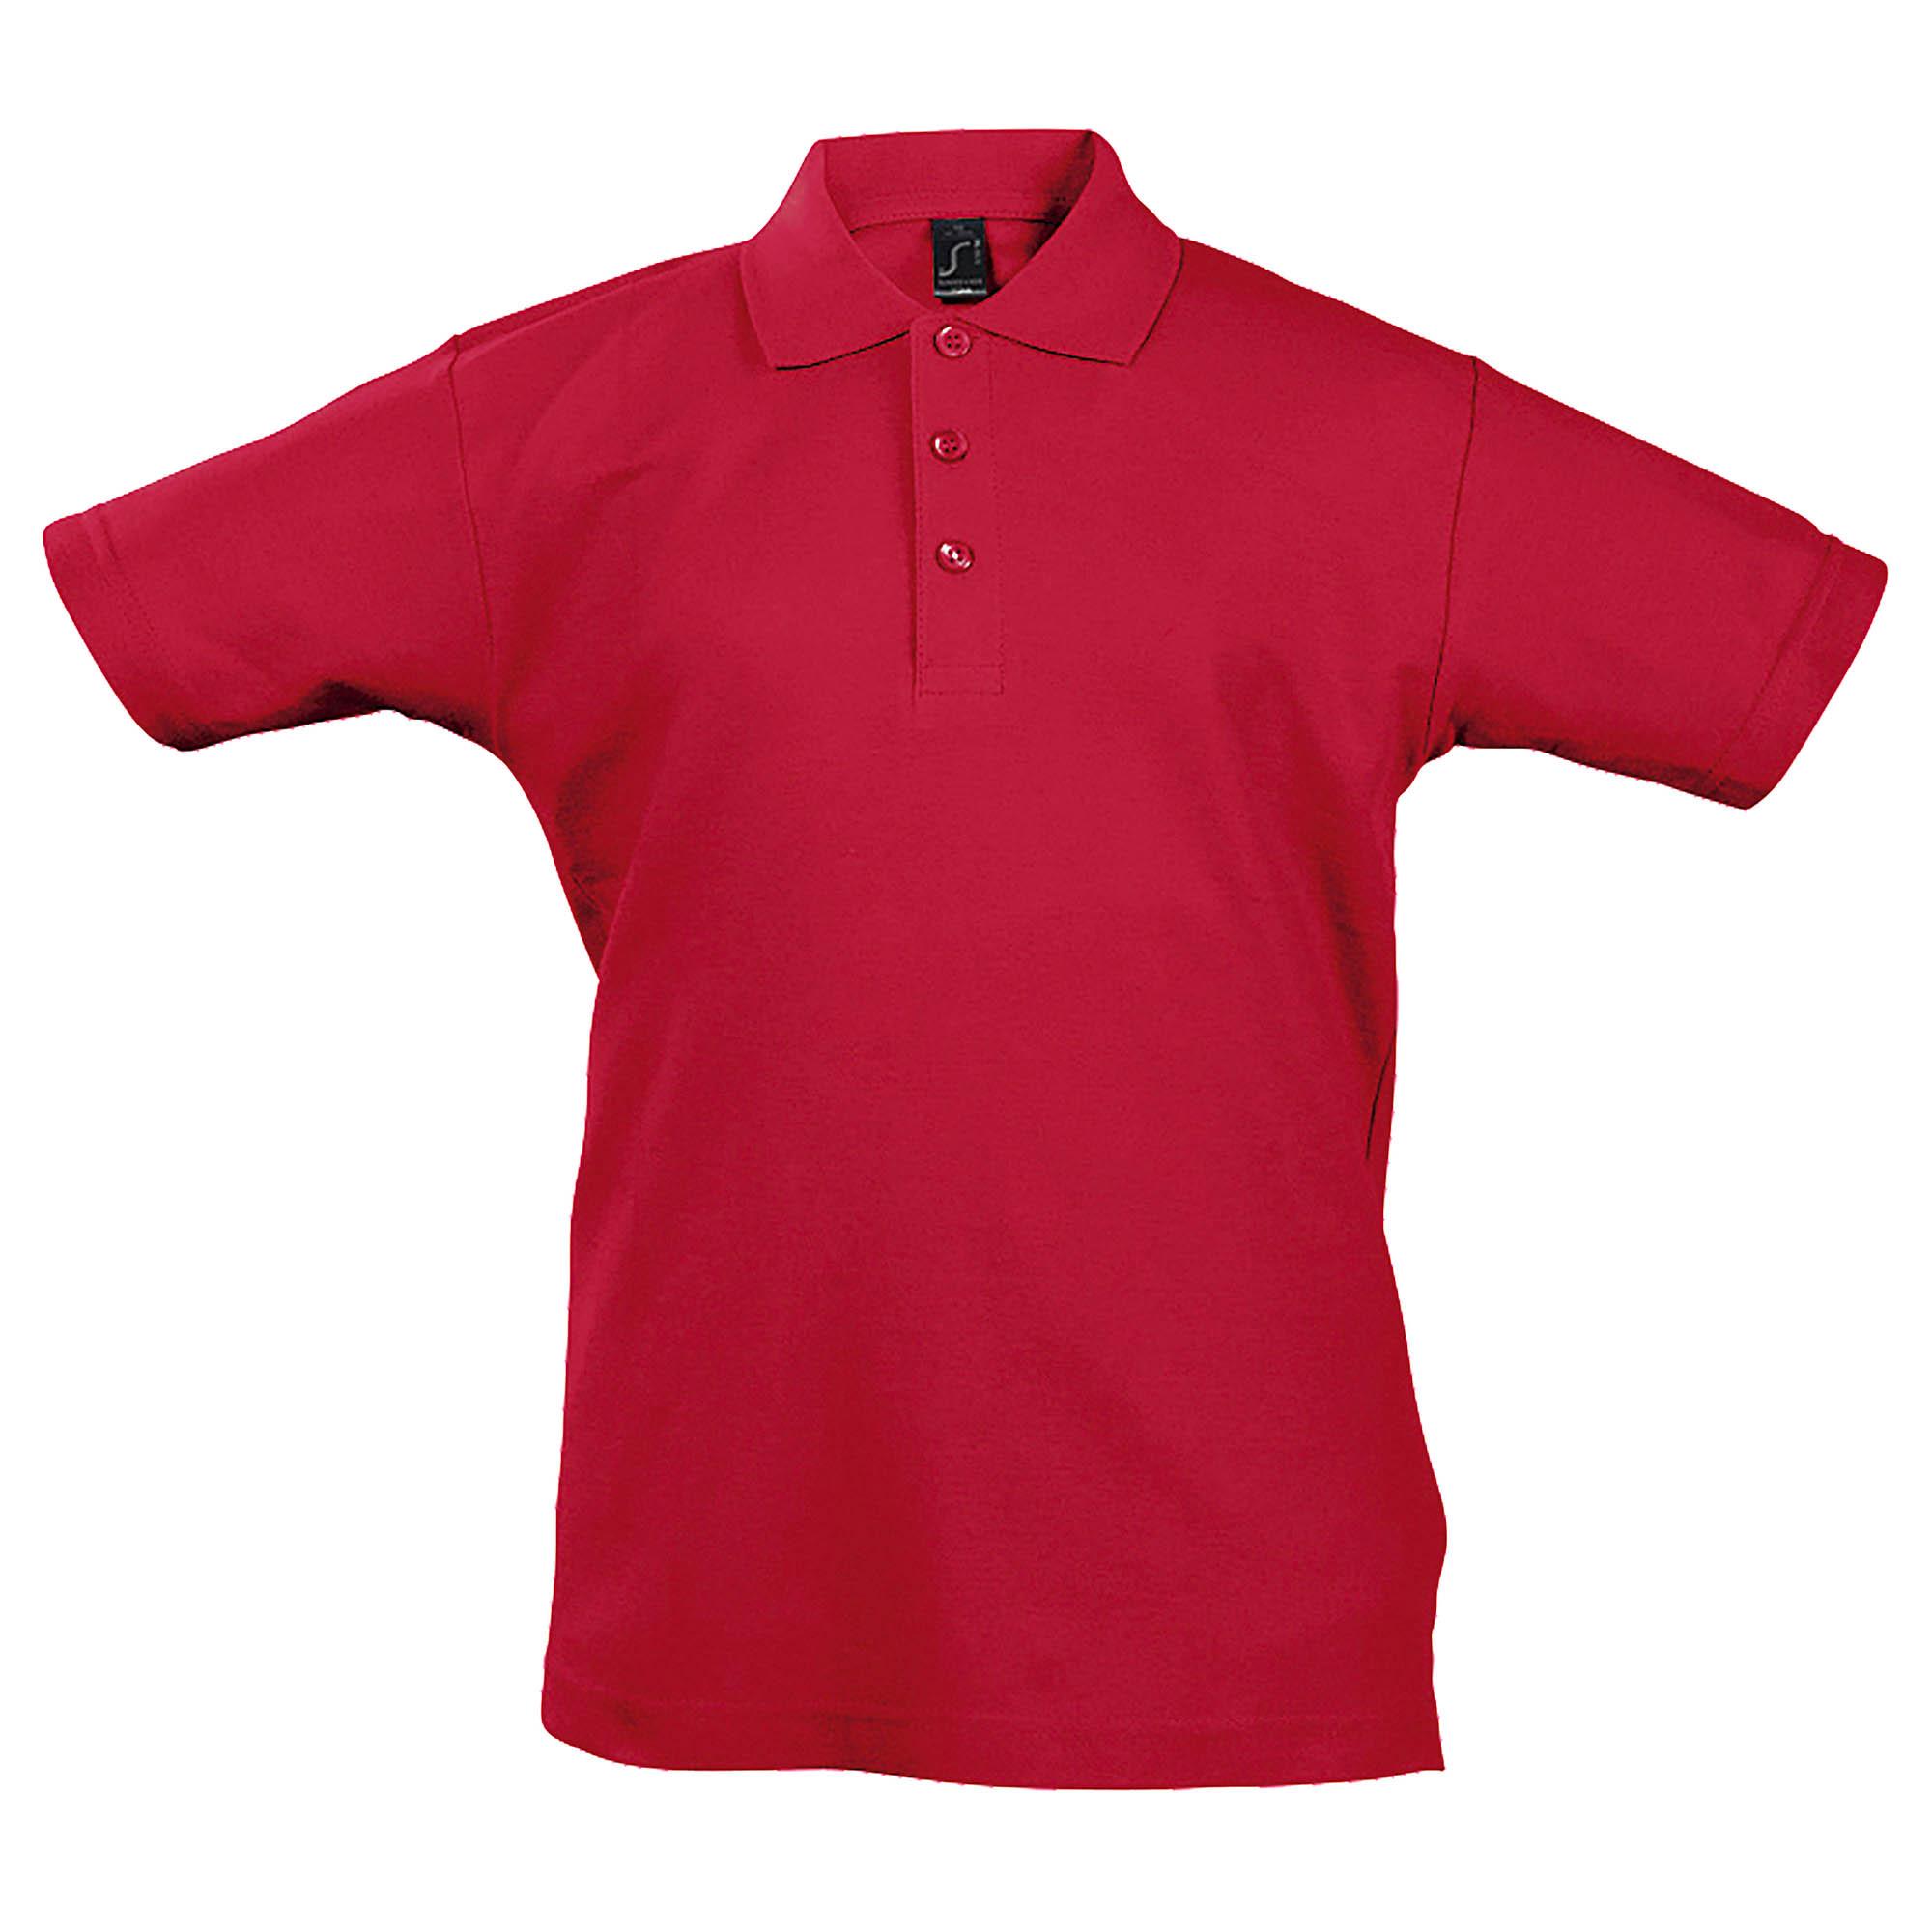 SOLS-Summer-II-Polo-100-coton-Enfant-unisexe-4-12-ans-11-PC362